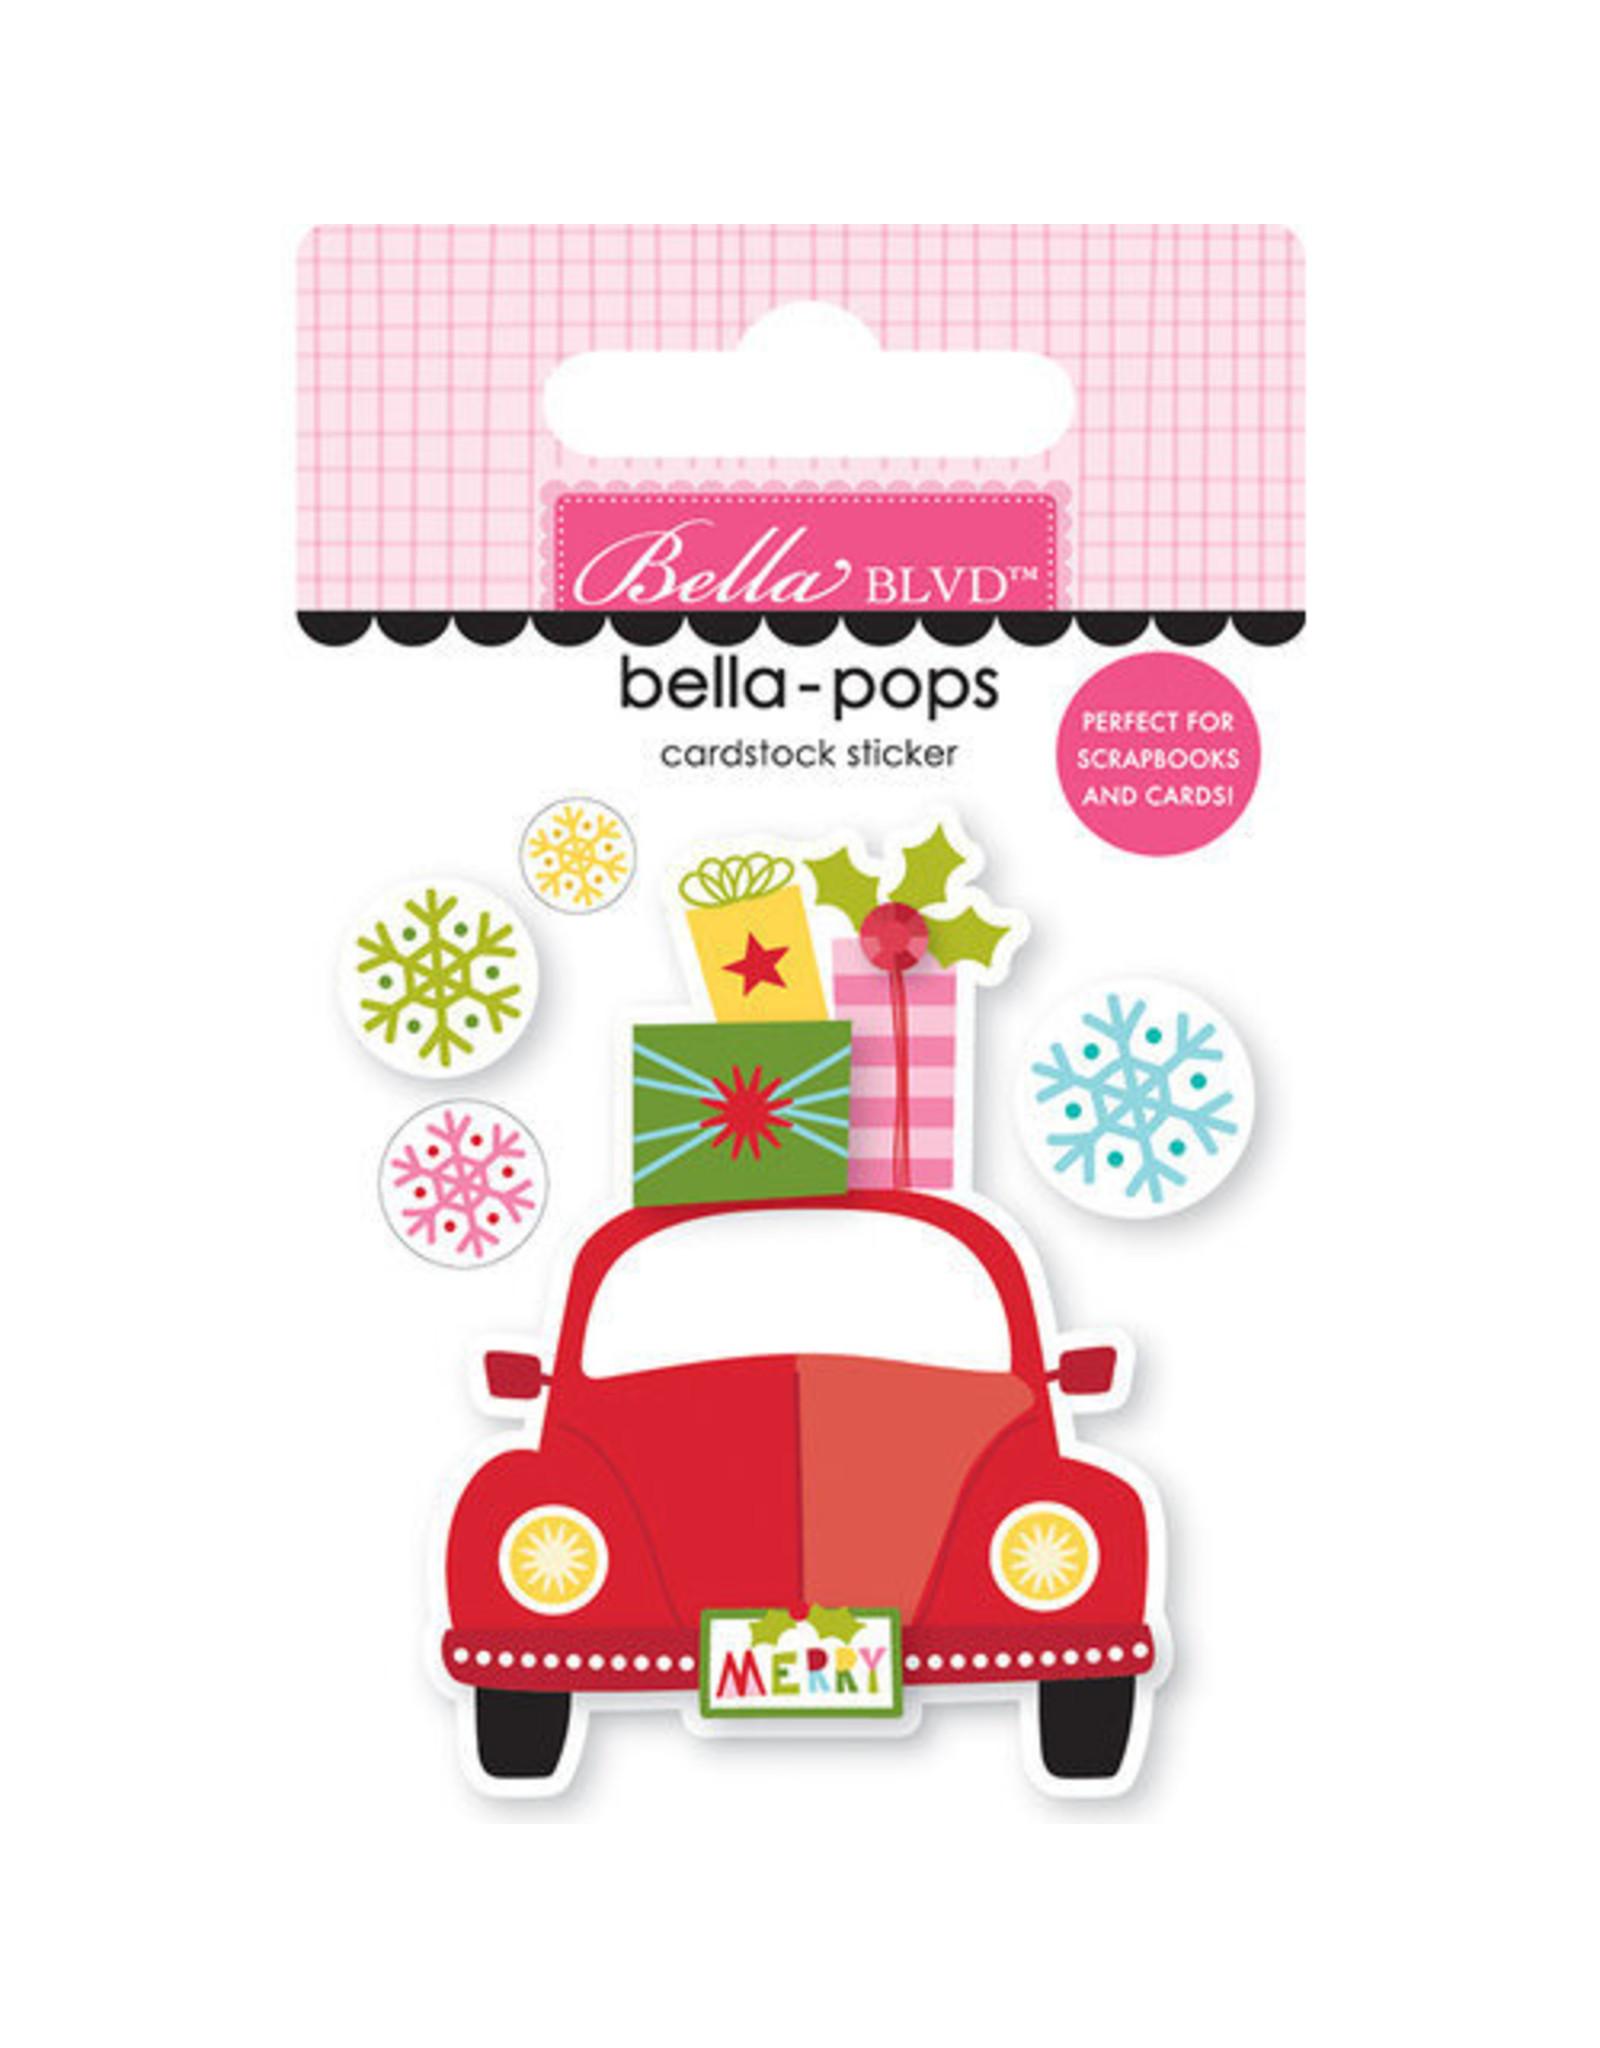 Bella Blvd Home for Christmas - Bella Pops